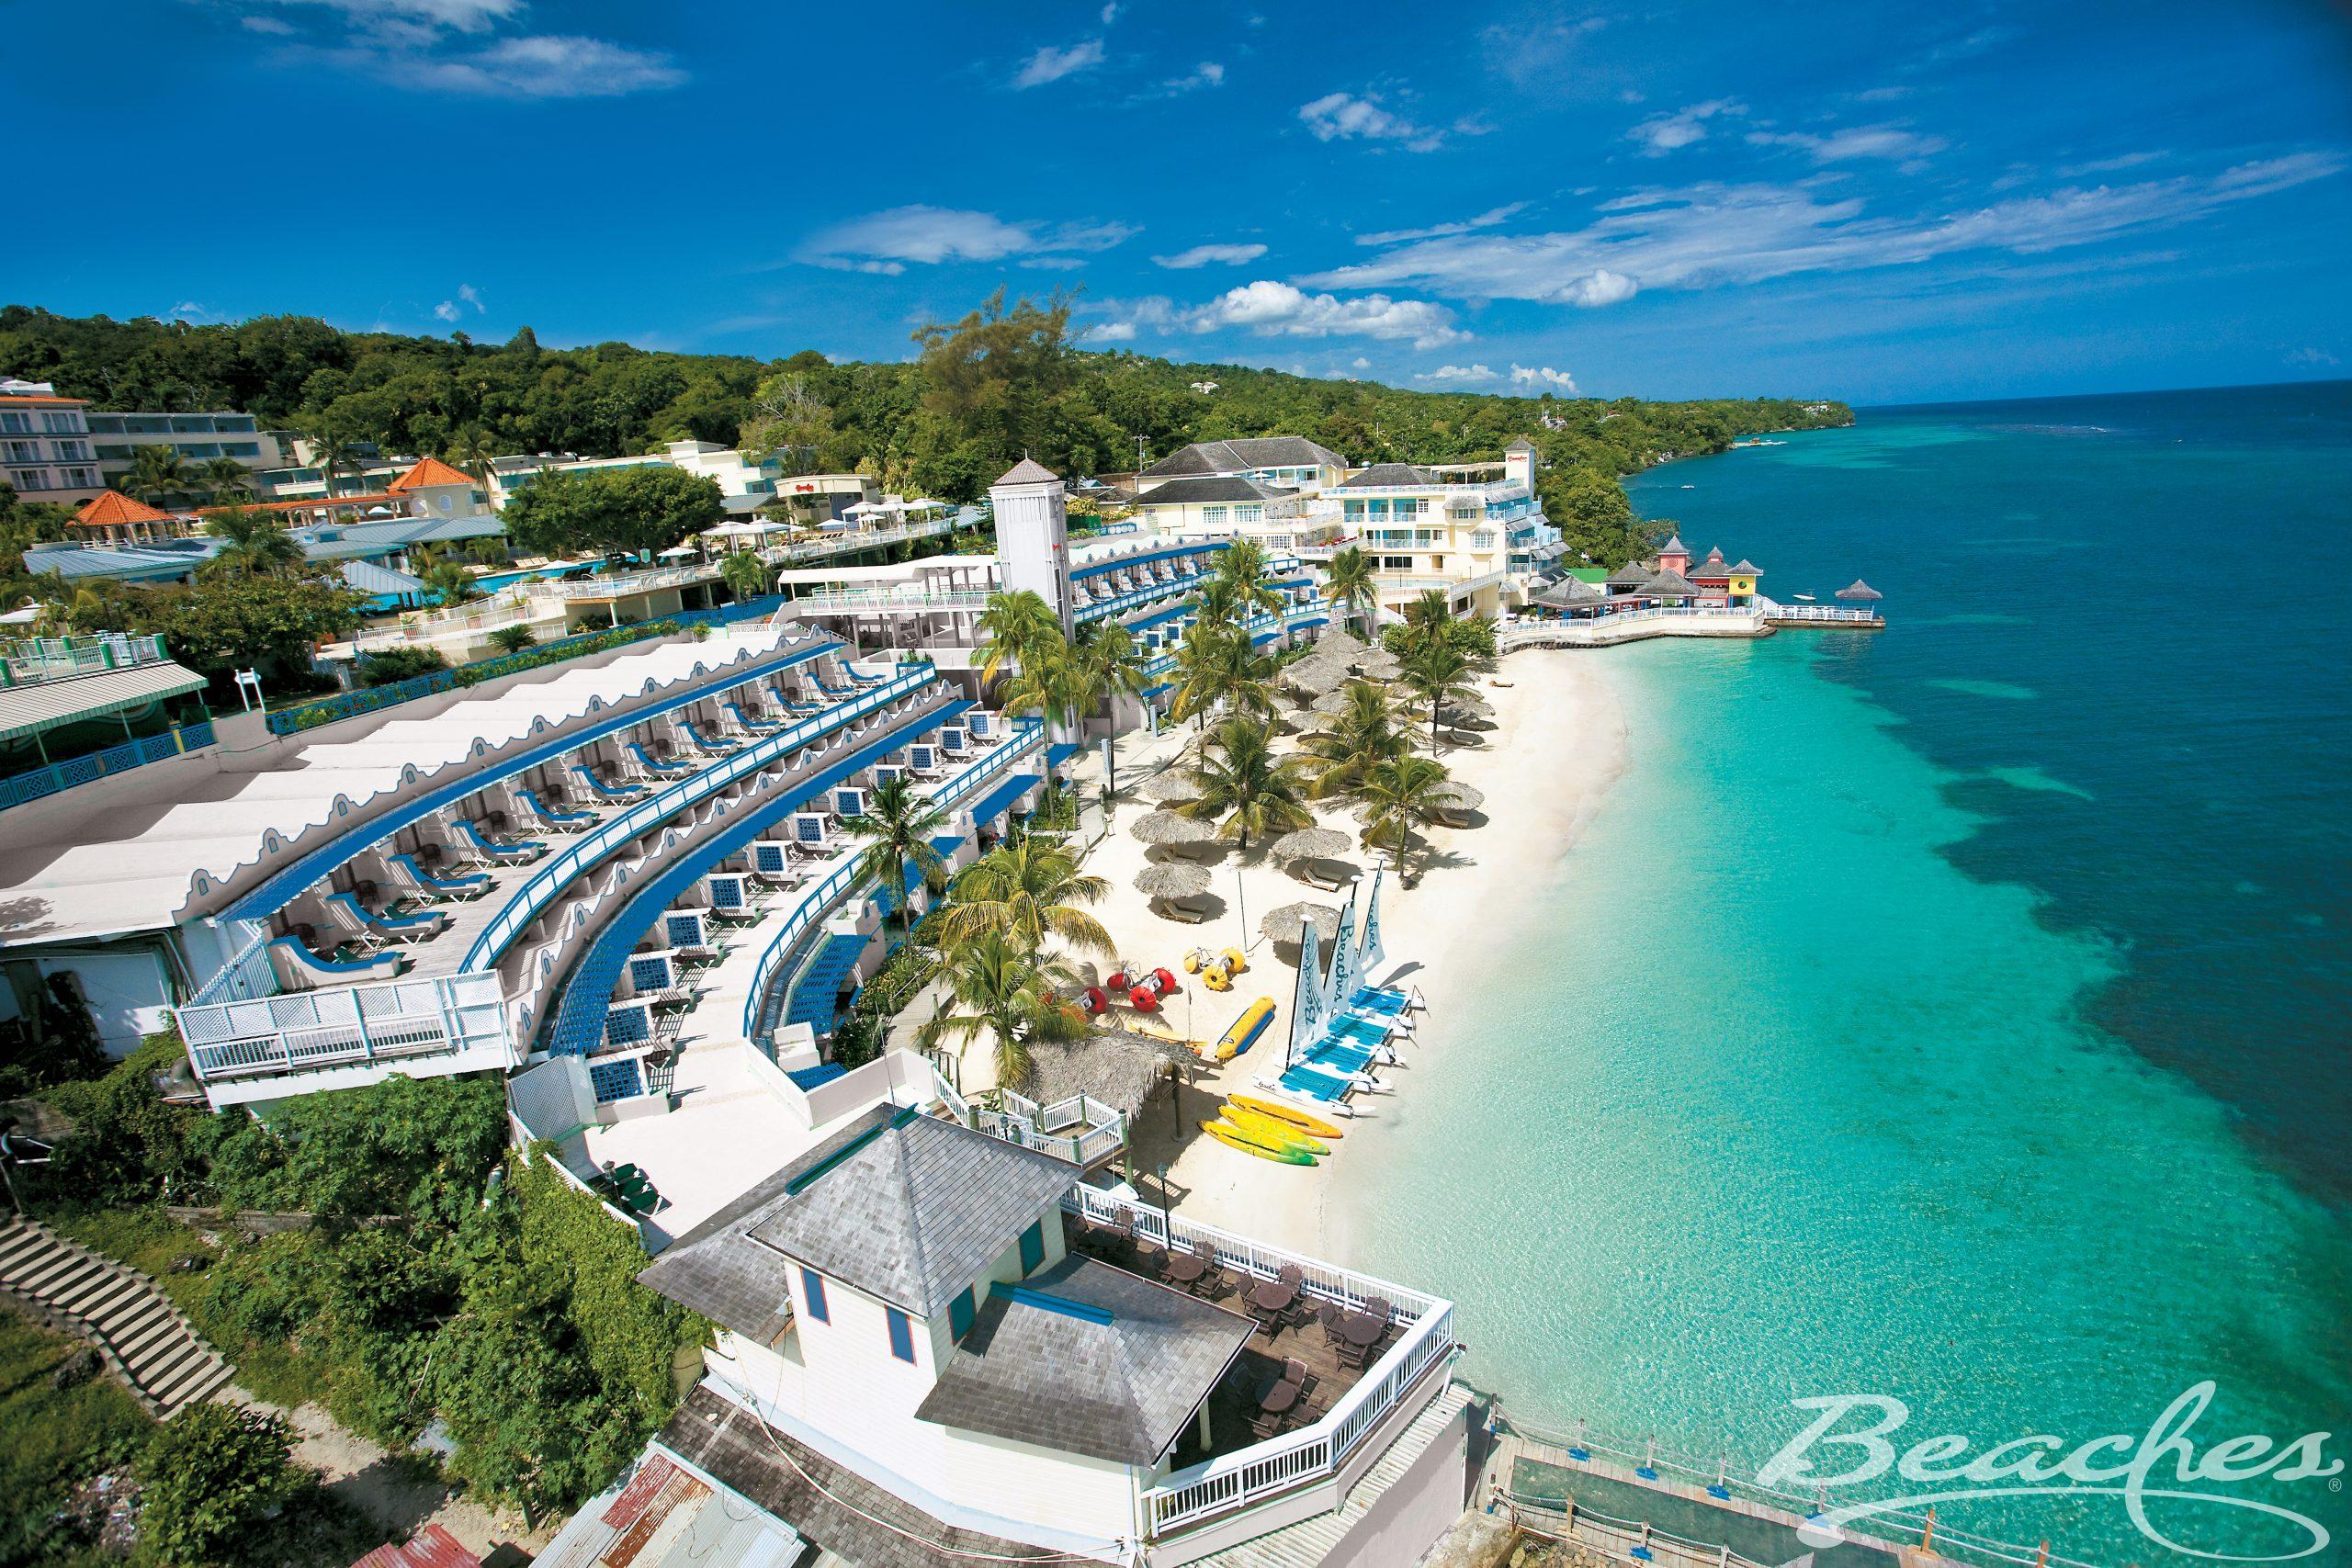 Beaches Ocho Rios Resort